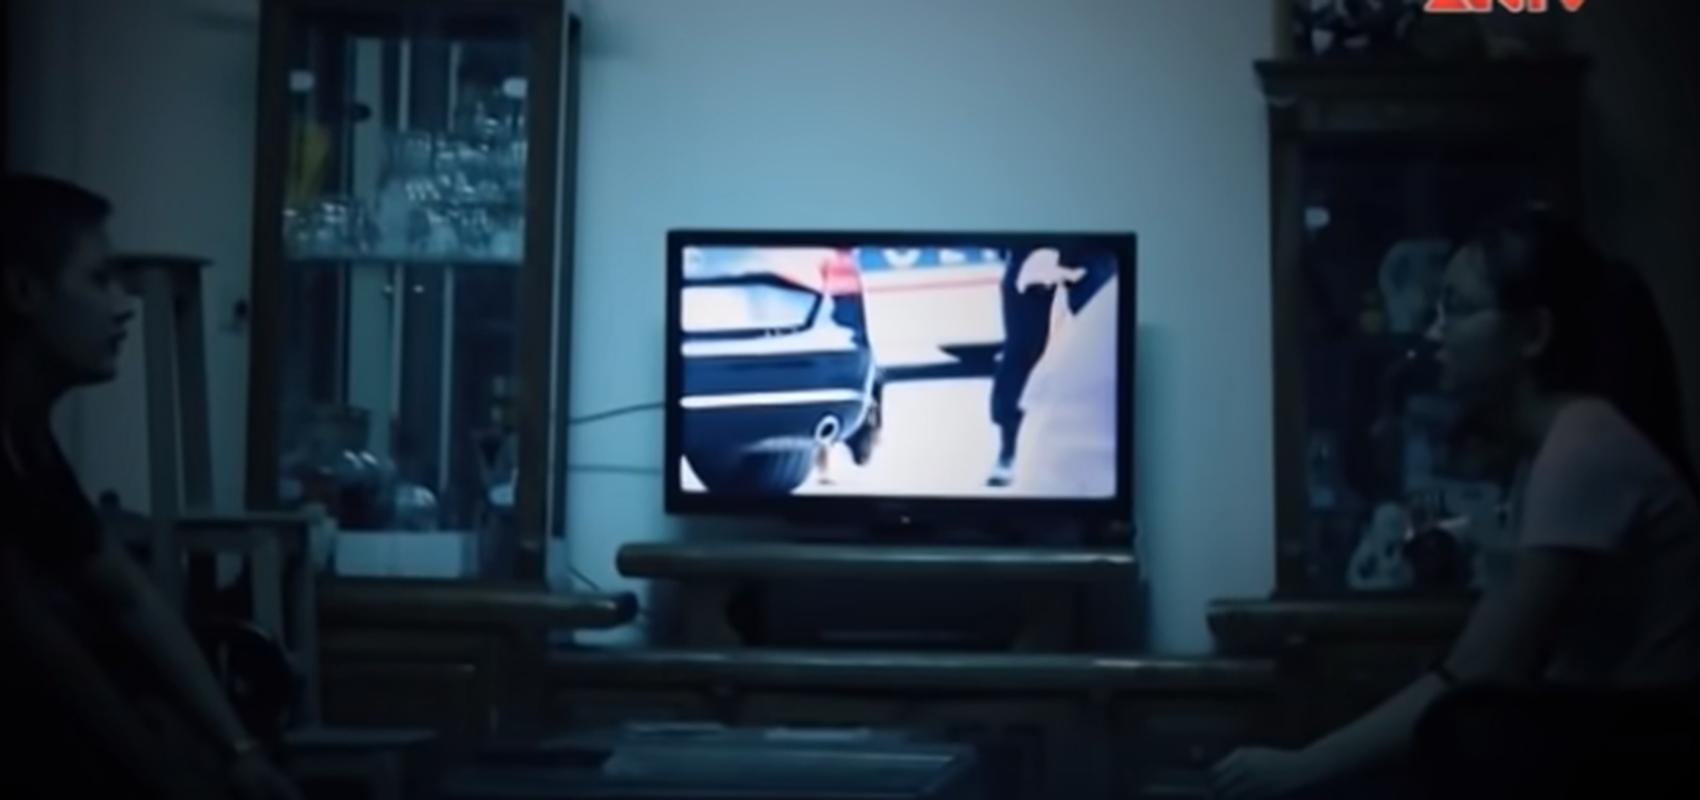 Hanh trinh pha an: Nu giam thi xinh dep va cai chet oan khuat trong dem-Hinh-5